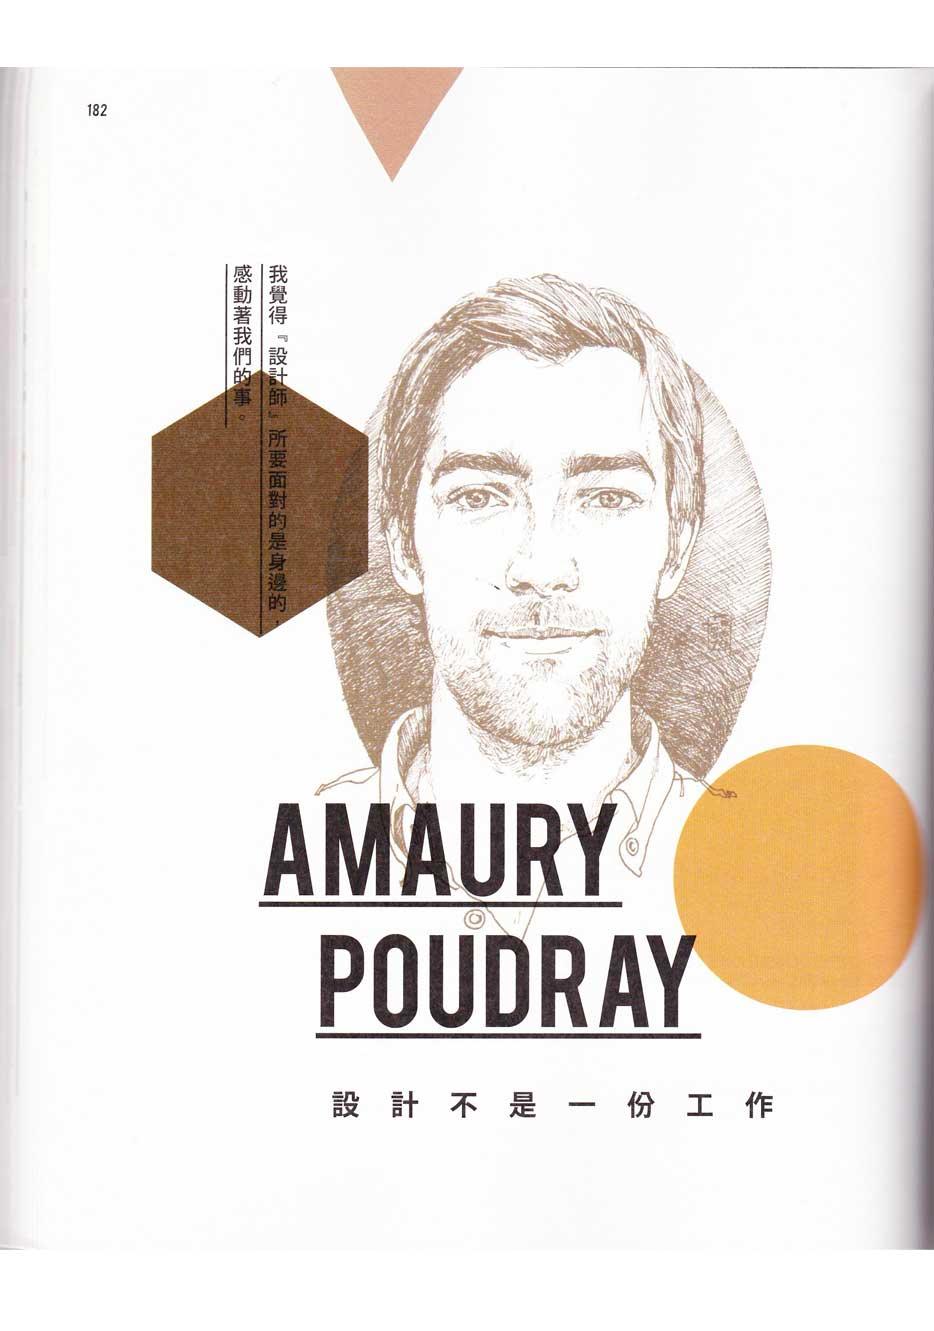 Amaury Poudray designer en chine